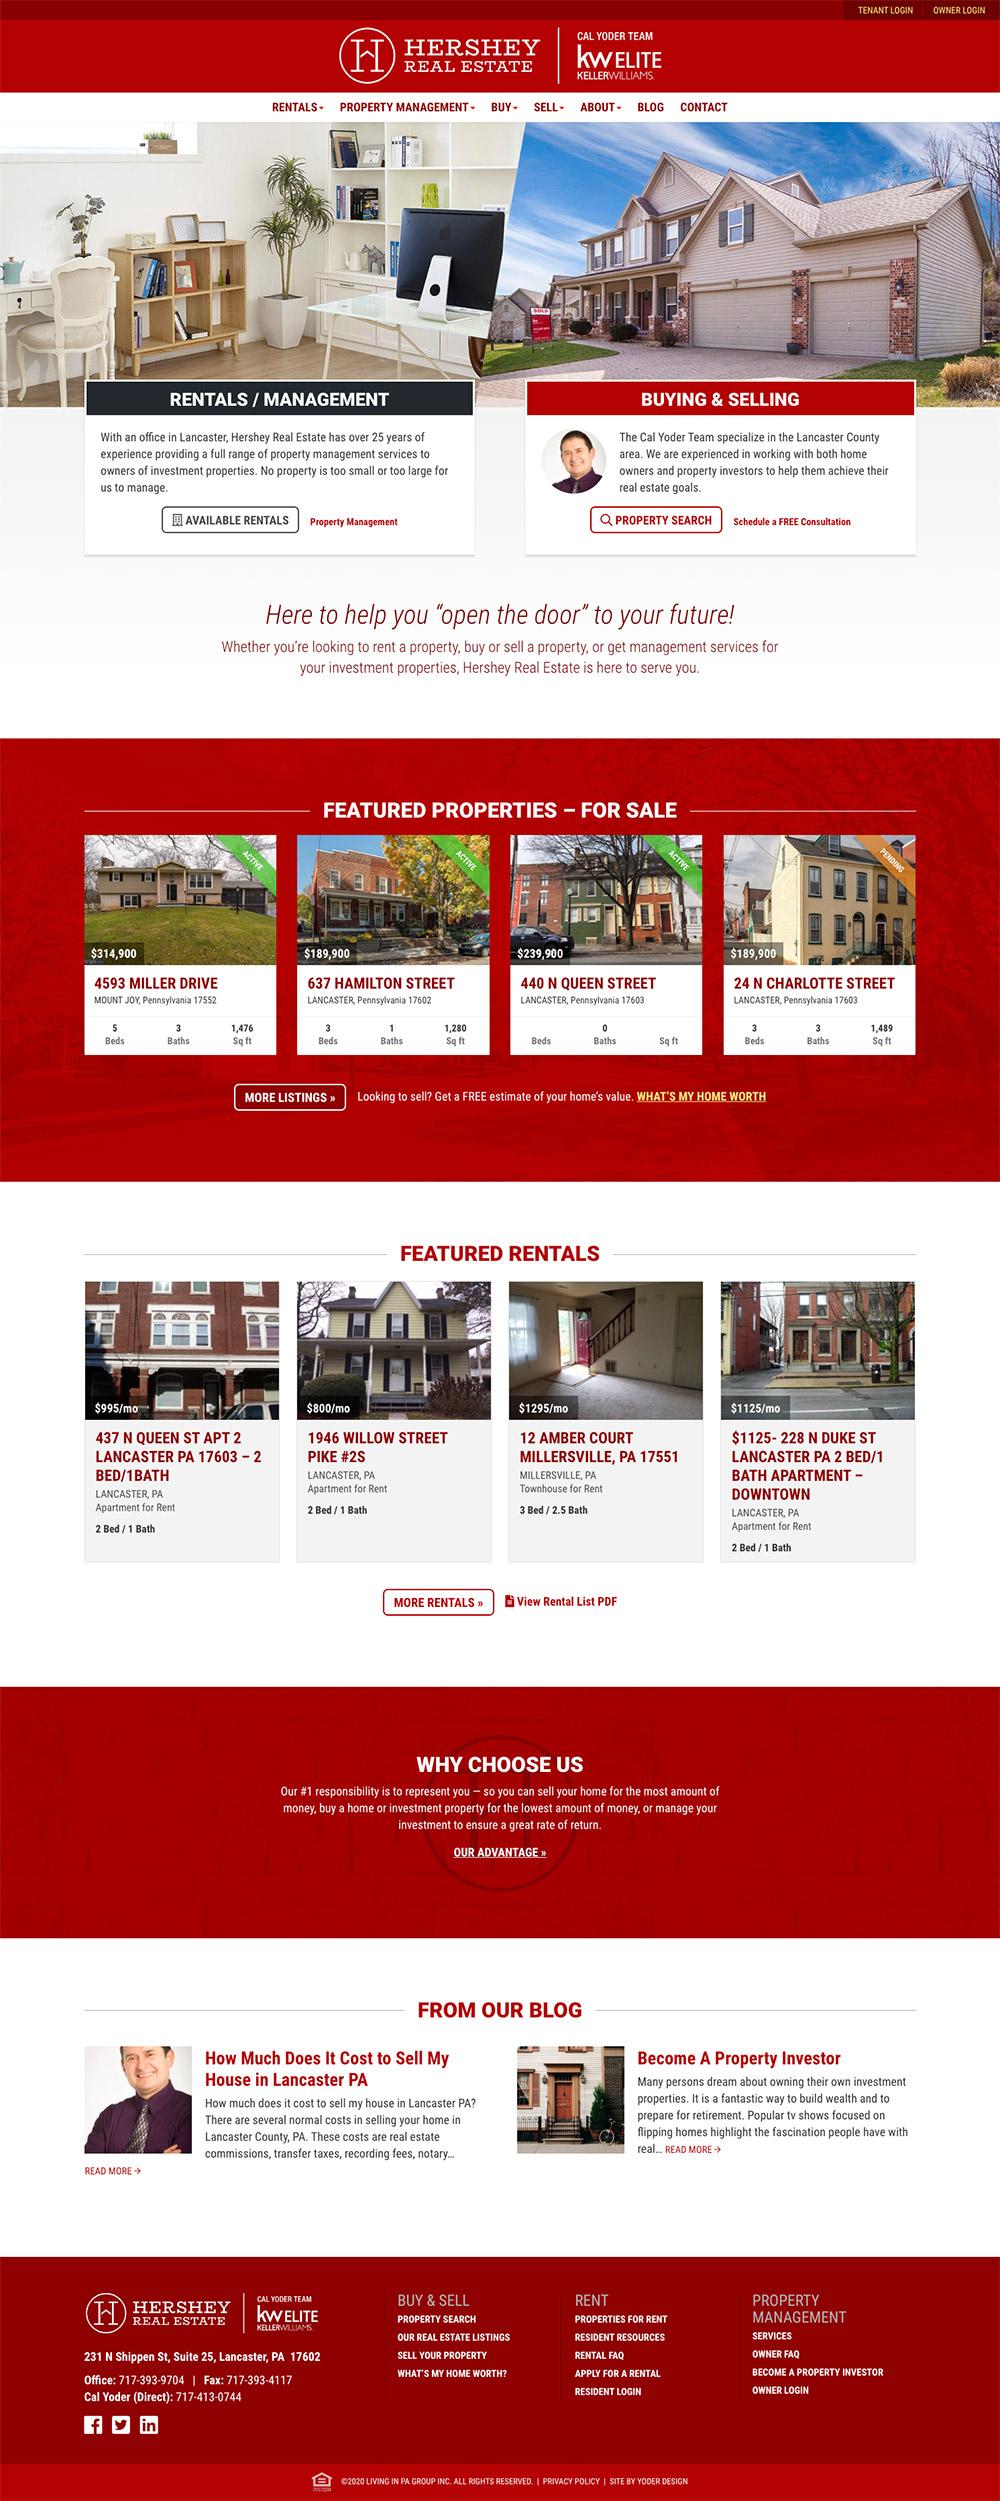 Hershey homepage screen capture